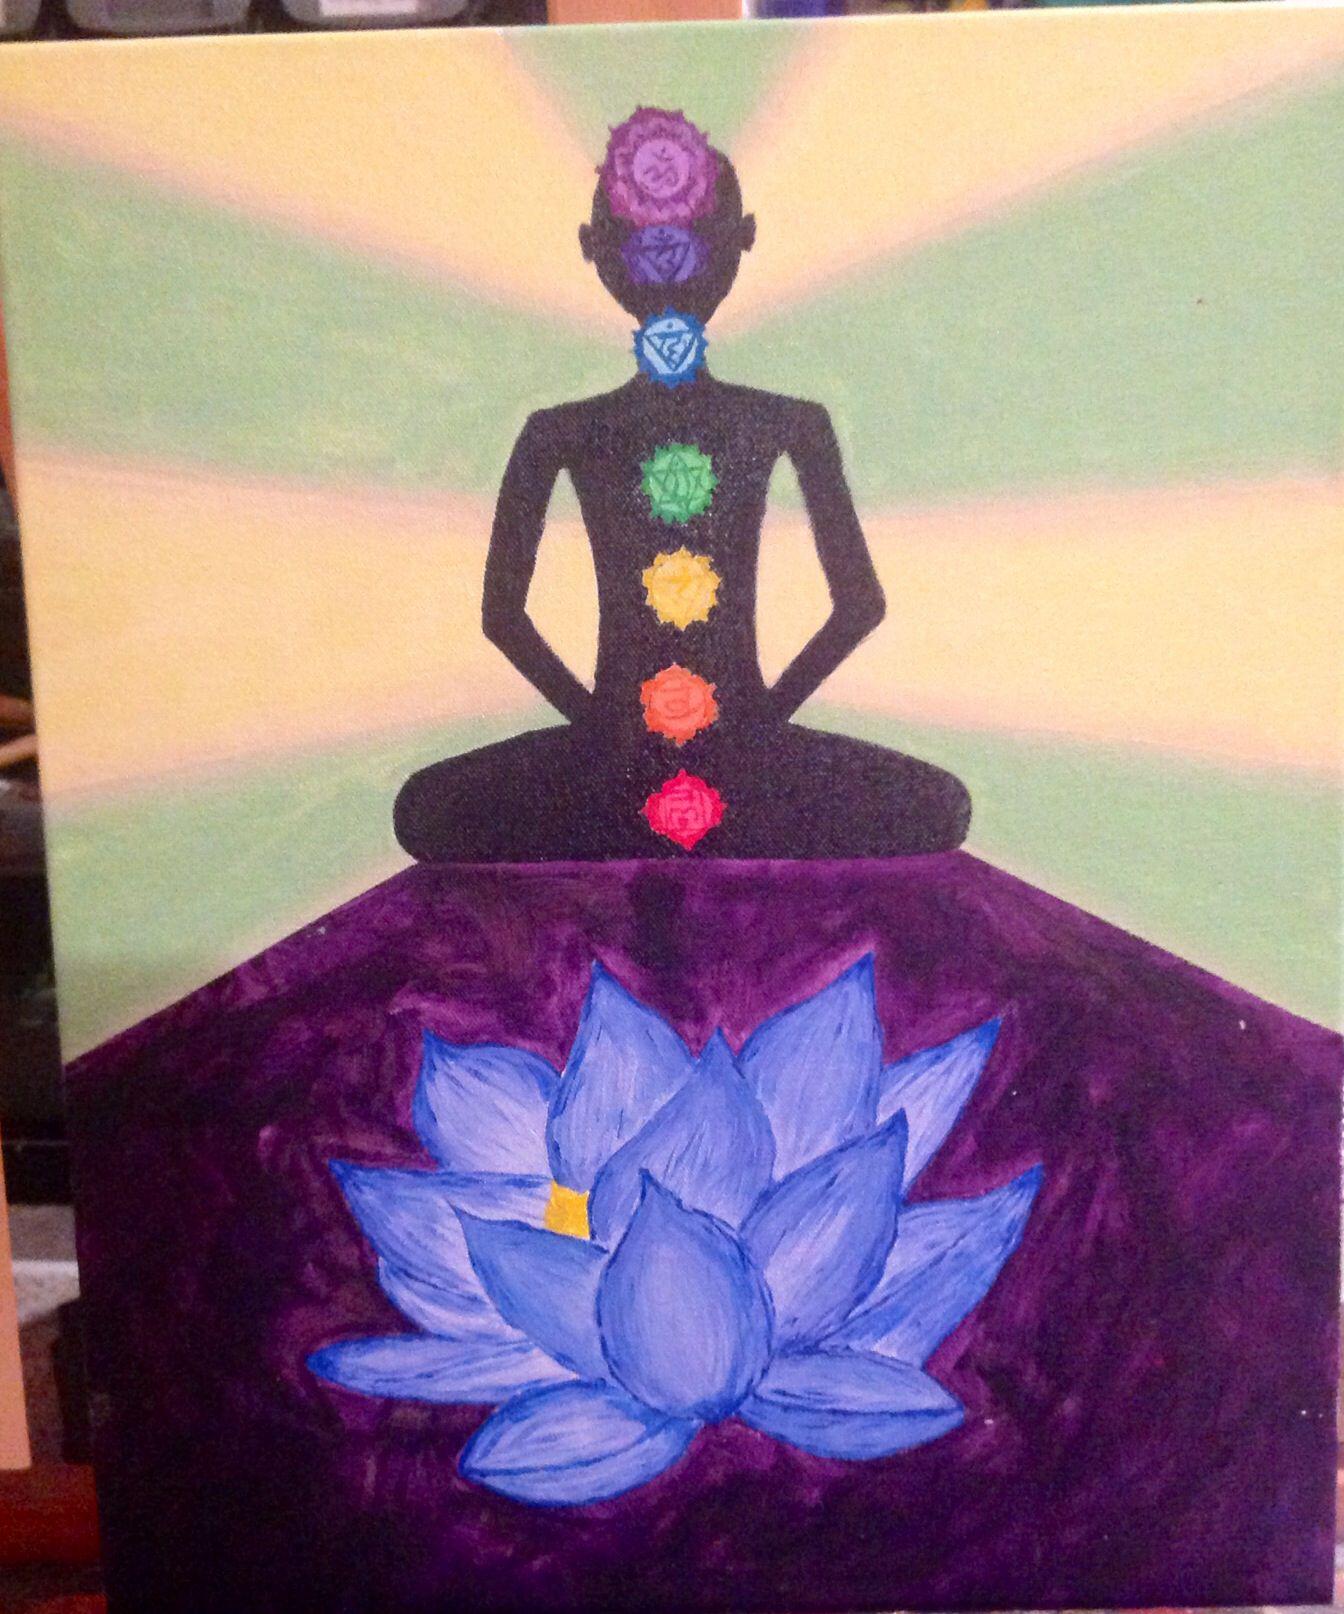 BUDDHIST LOTUS CHAKRAS MEDITATION Painting Illustration Canvas art Prints